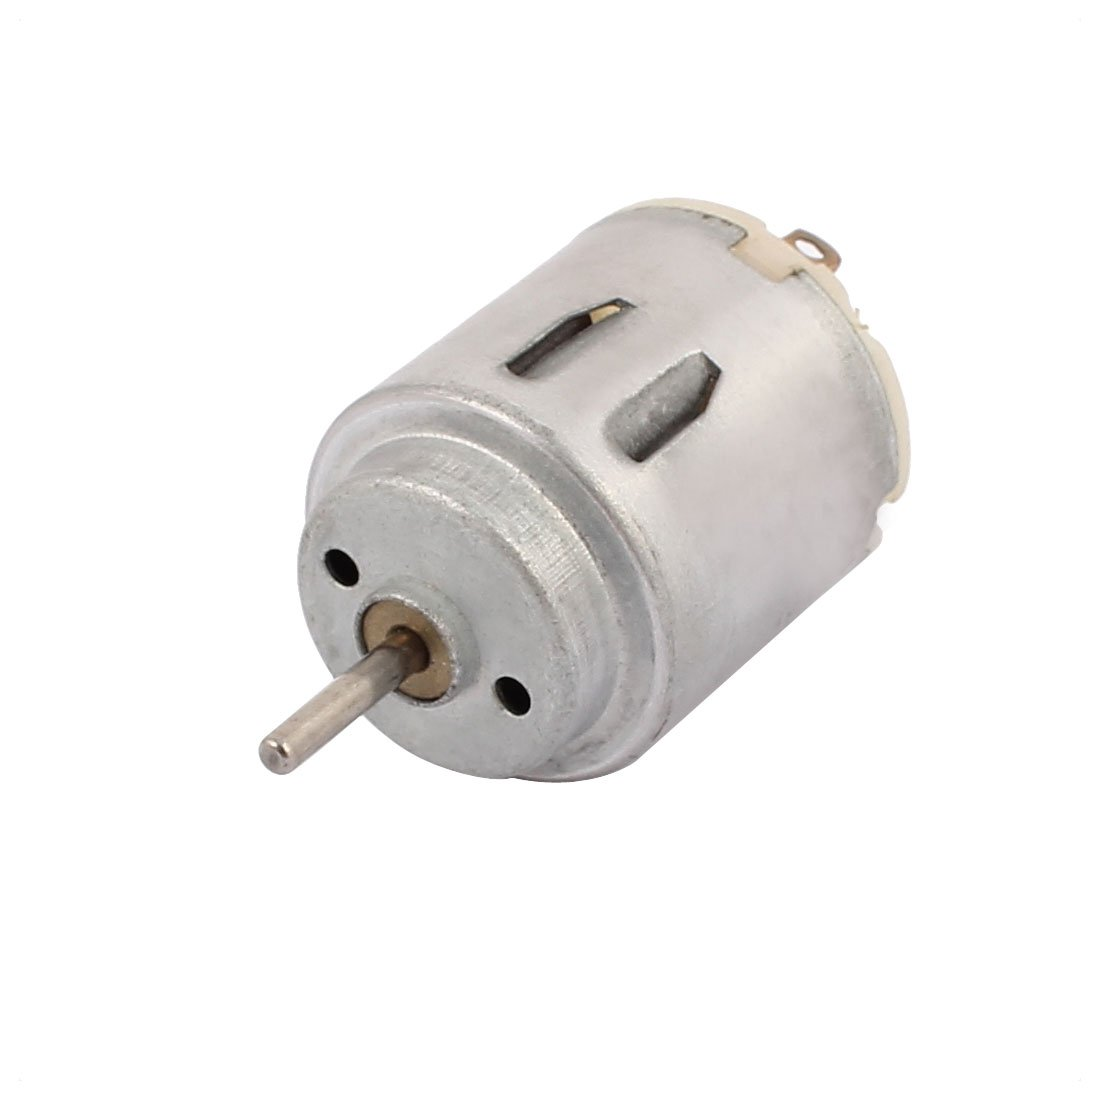 ef58af4d875 SOURCING MAP sourcingmap DC 3-12V 22200RPM Motor eléctrico de vibración  giratoria para RC Barco juguetes modelo DIY  Amazon.es  Industria